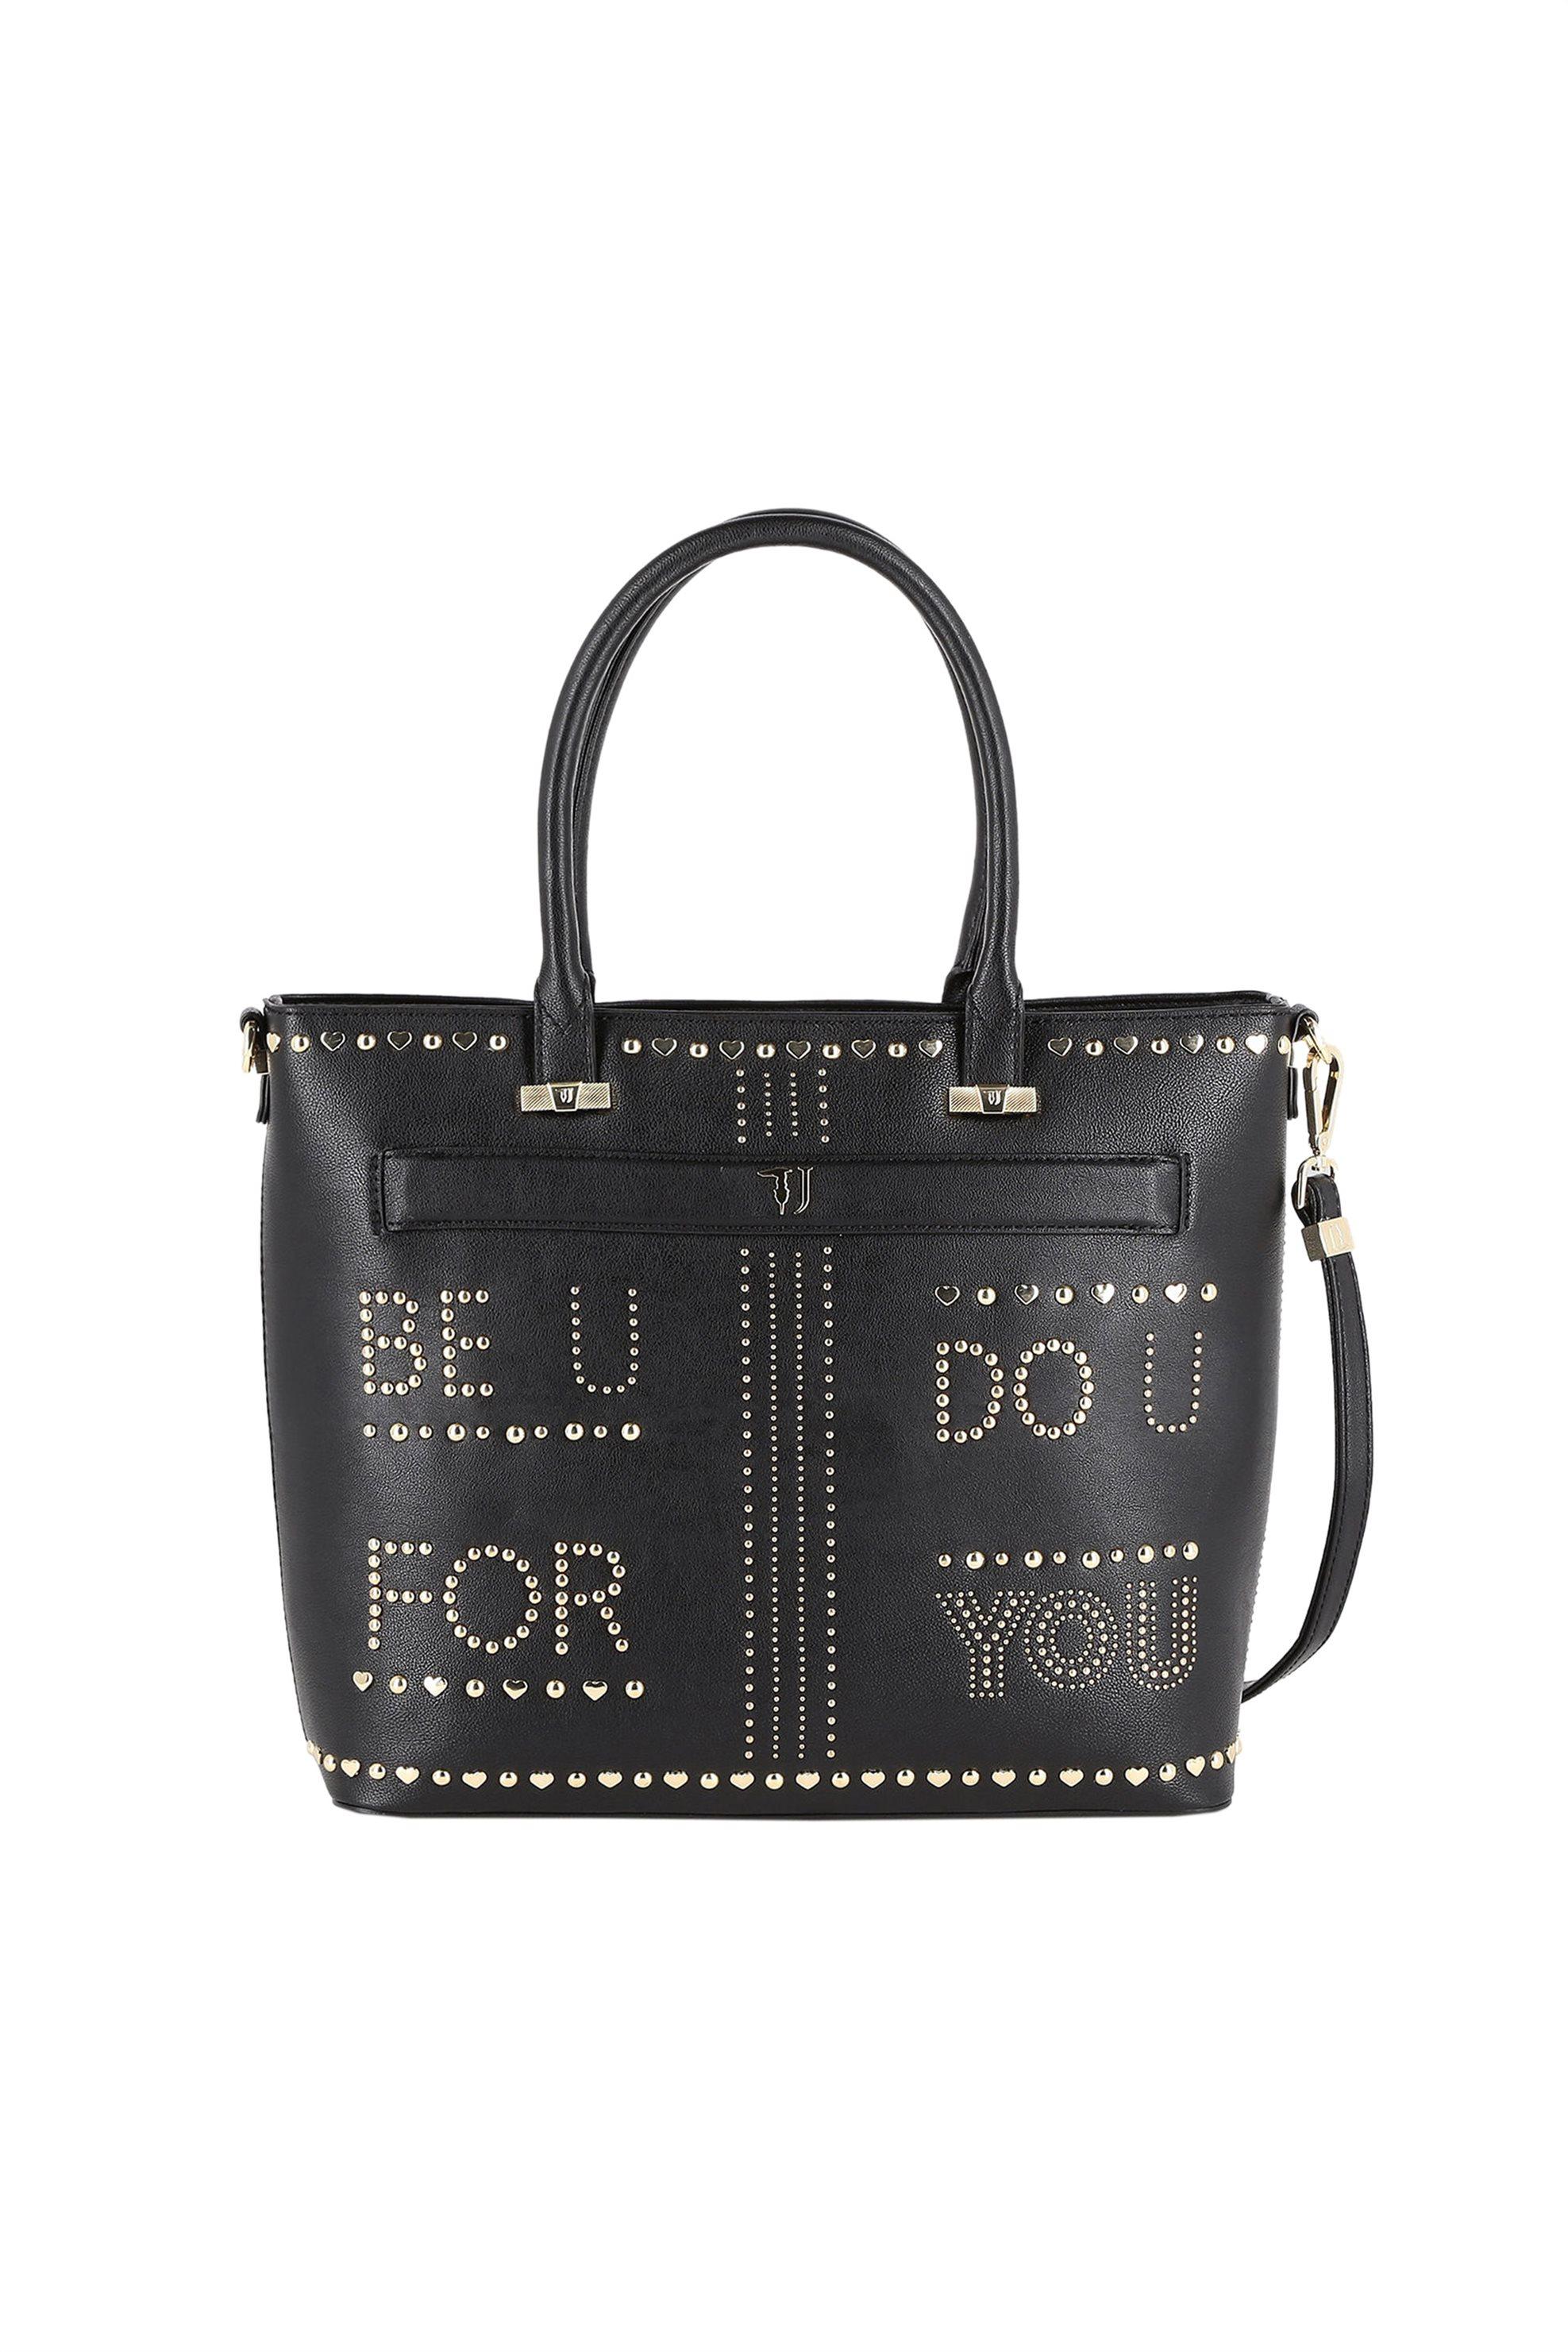 Trussardi Jeans γυναικεία τσάντα shopping με lettering από μεταλλικά στοιχεία -  γυναικα   τσαντεσ   ώμου   shopper bags